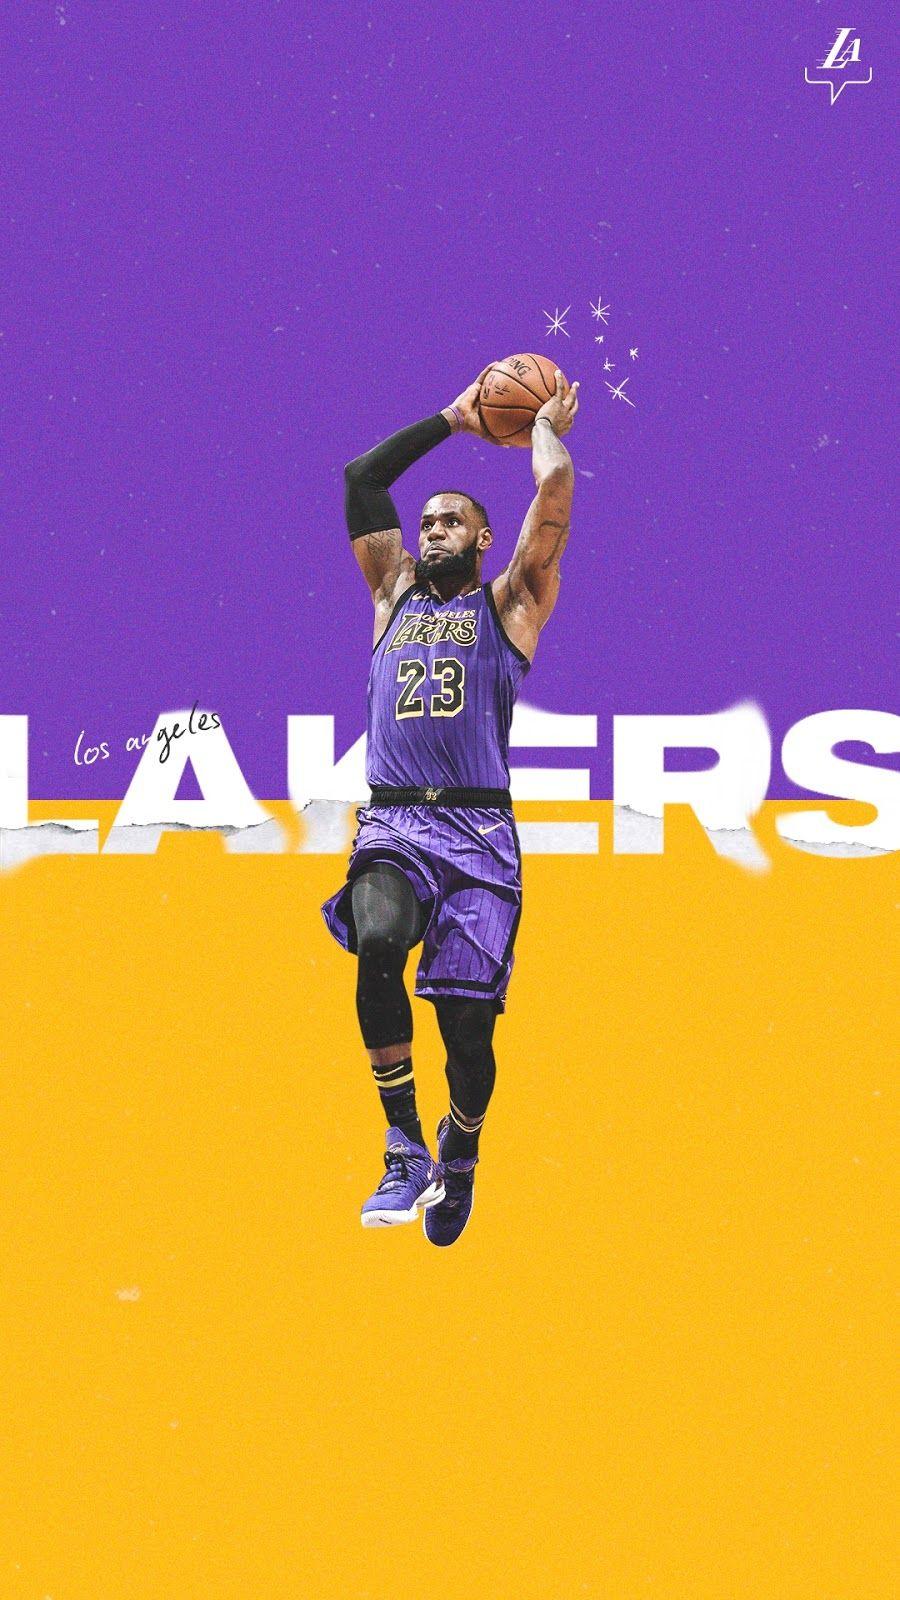 Lebron James Mobile Wallpaper Los Angeles Lakers Nba Lebron James Wallpapers Lebron James Pictures Lebron James Lakers